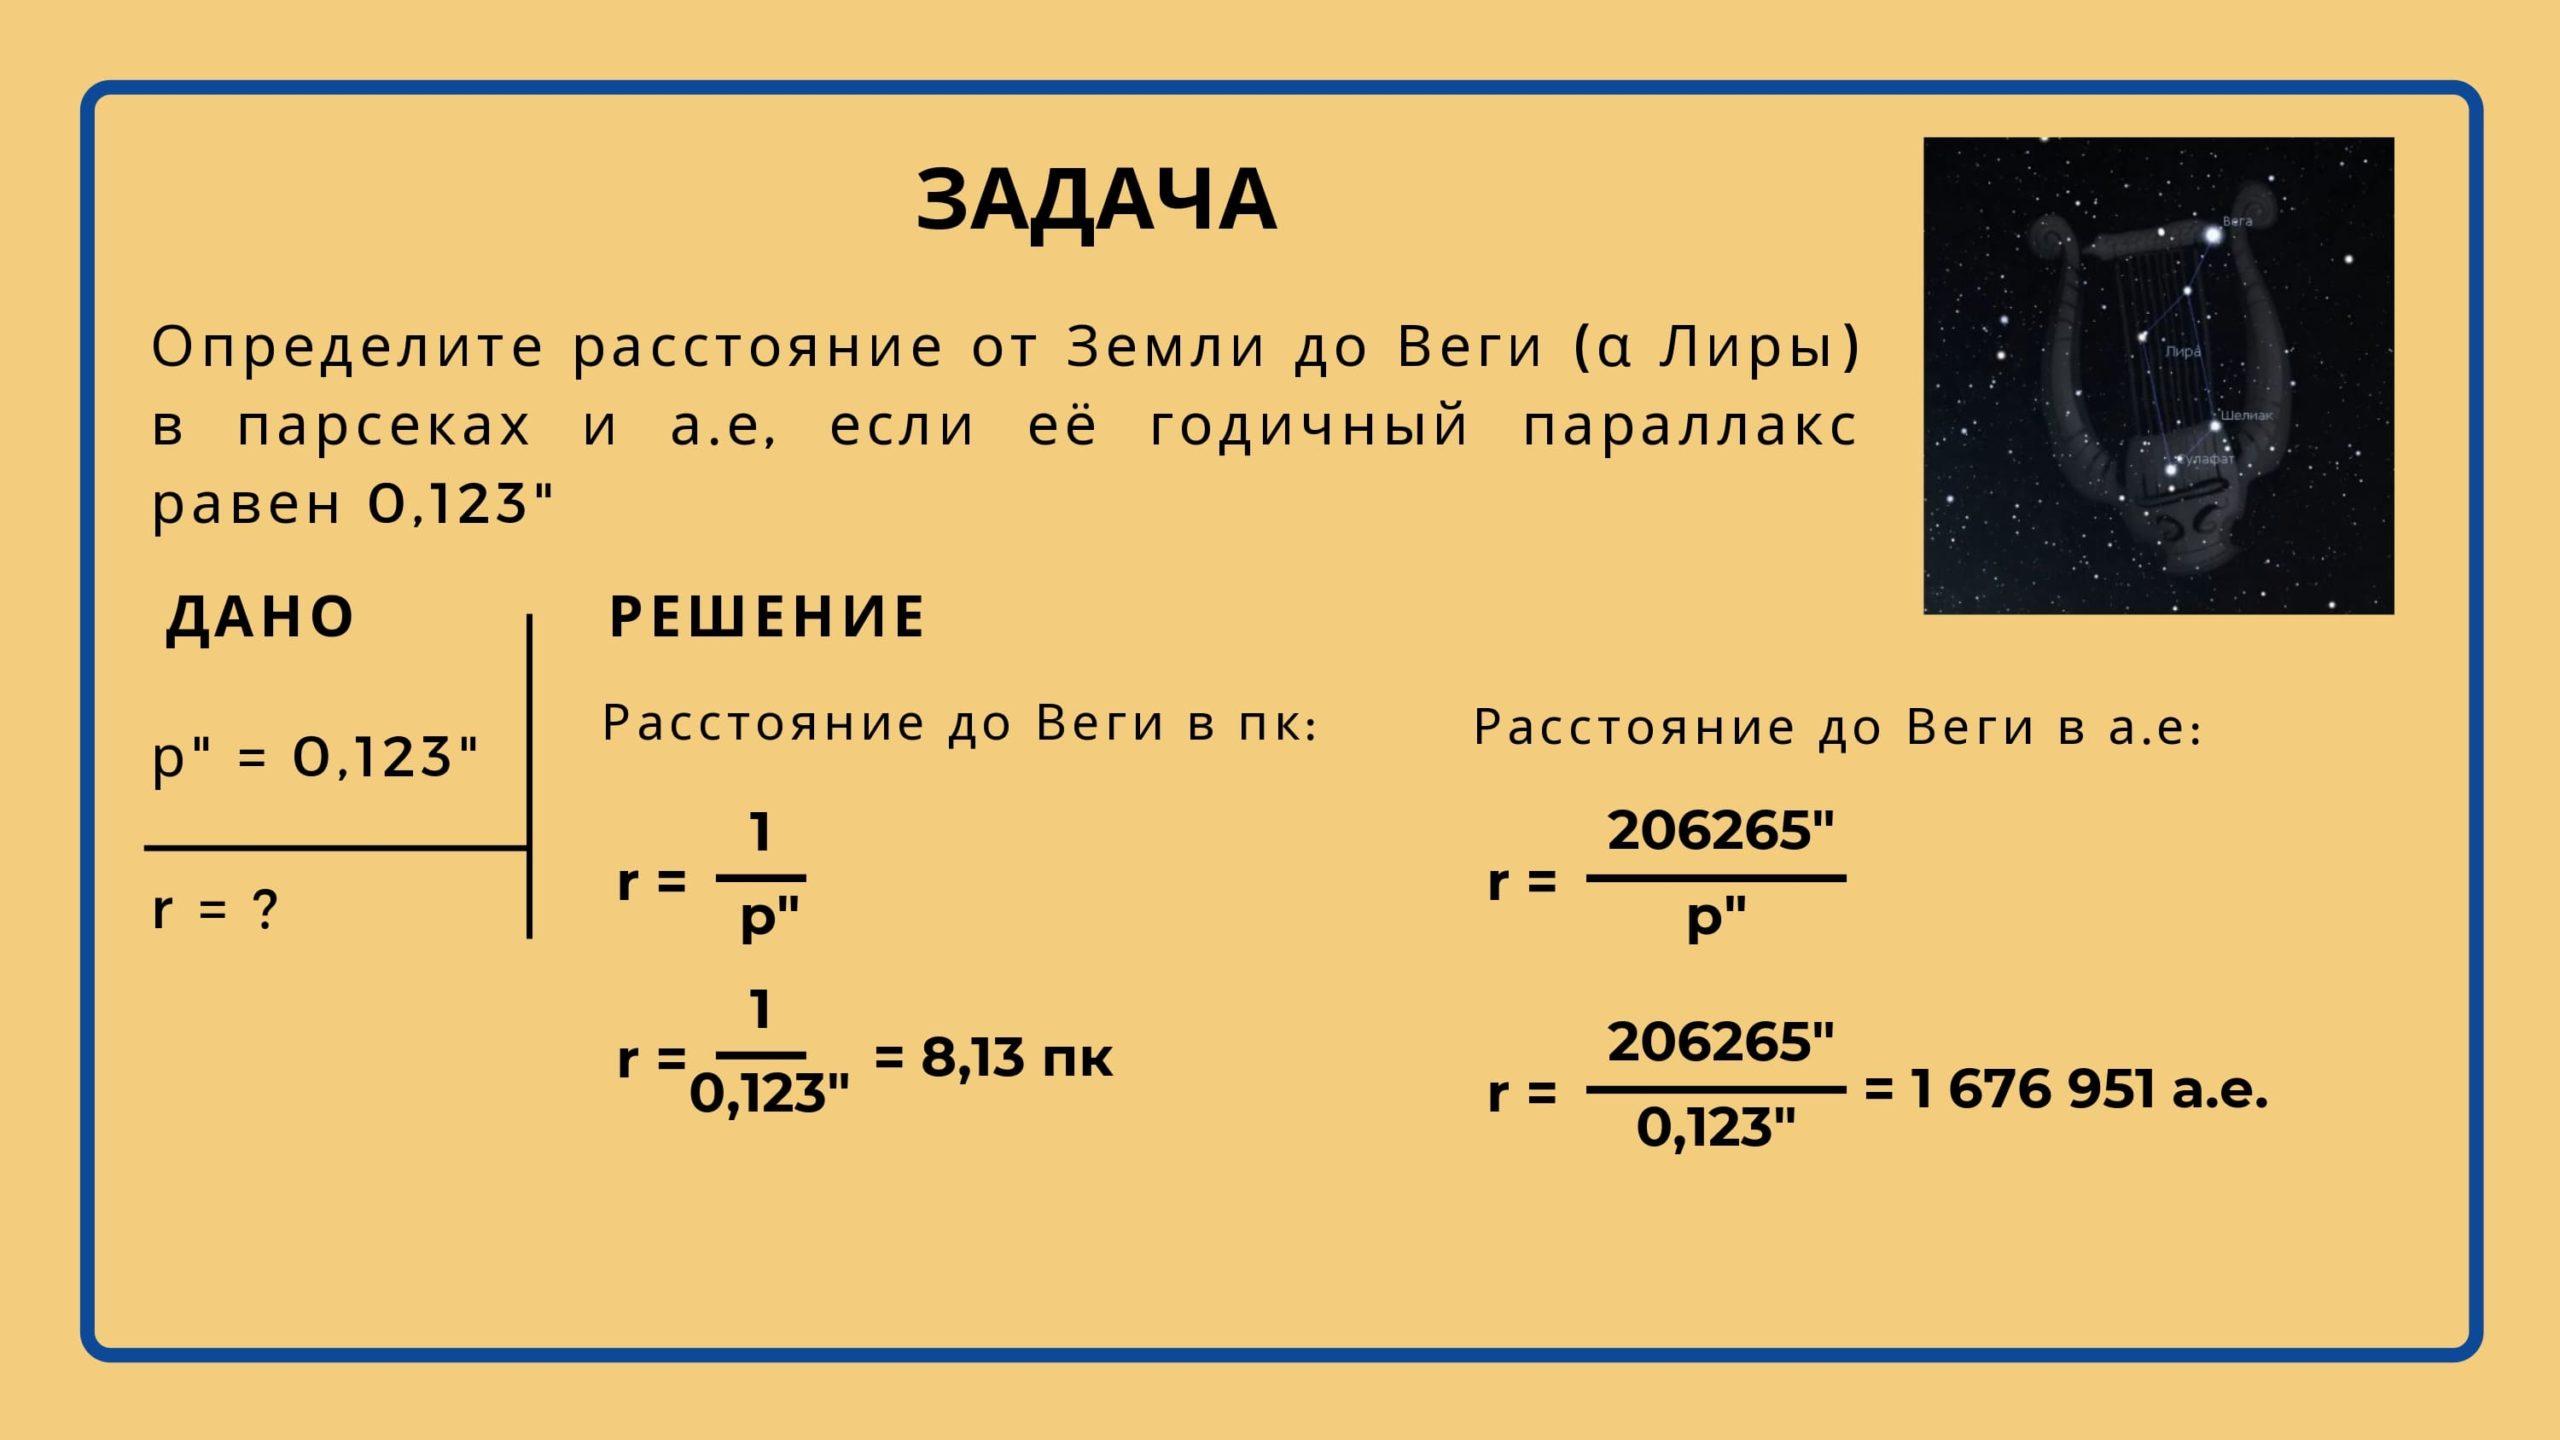 Задача. Определите расстояние от Земли до Веги (α Лиры) в парсеках